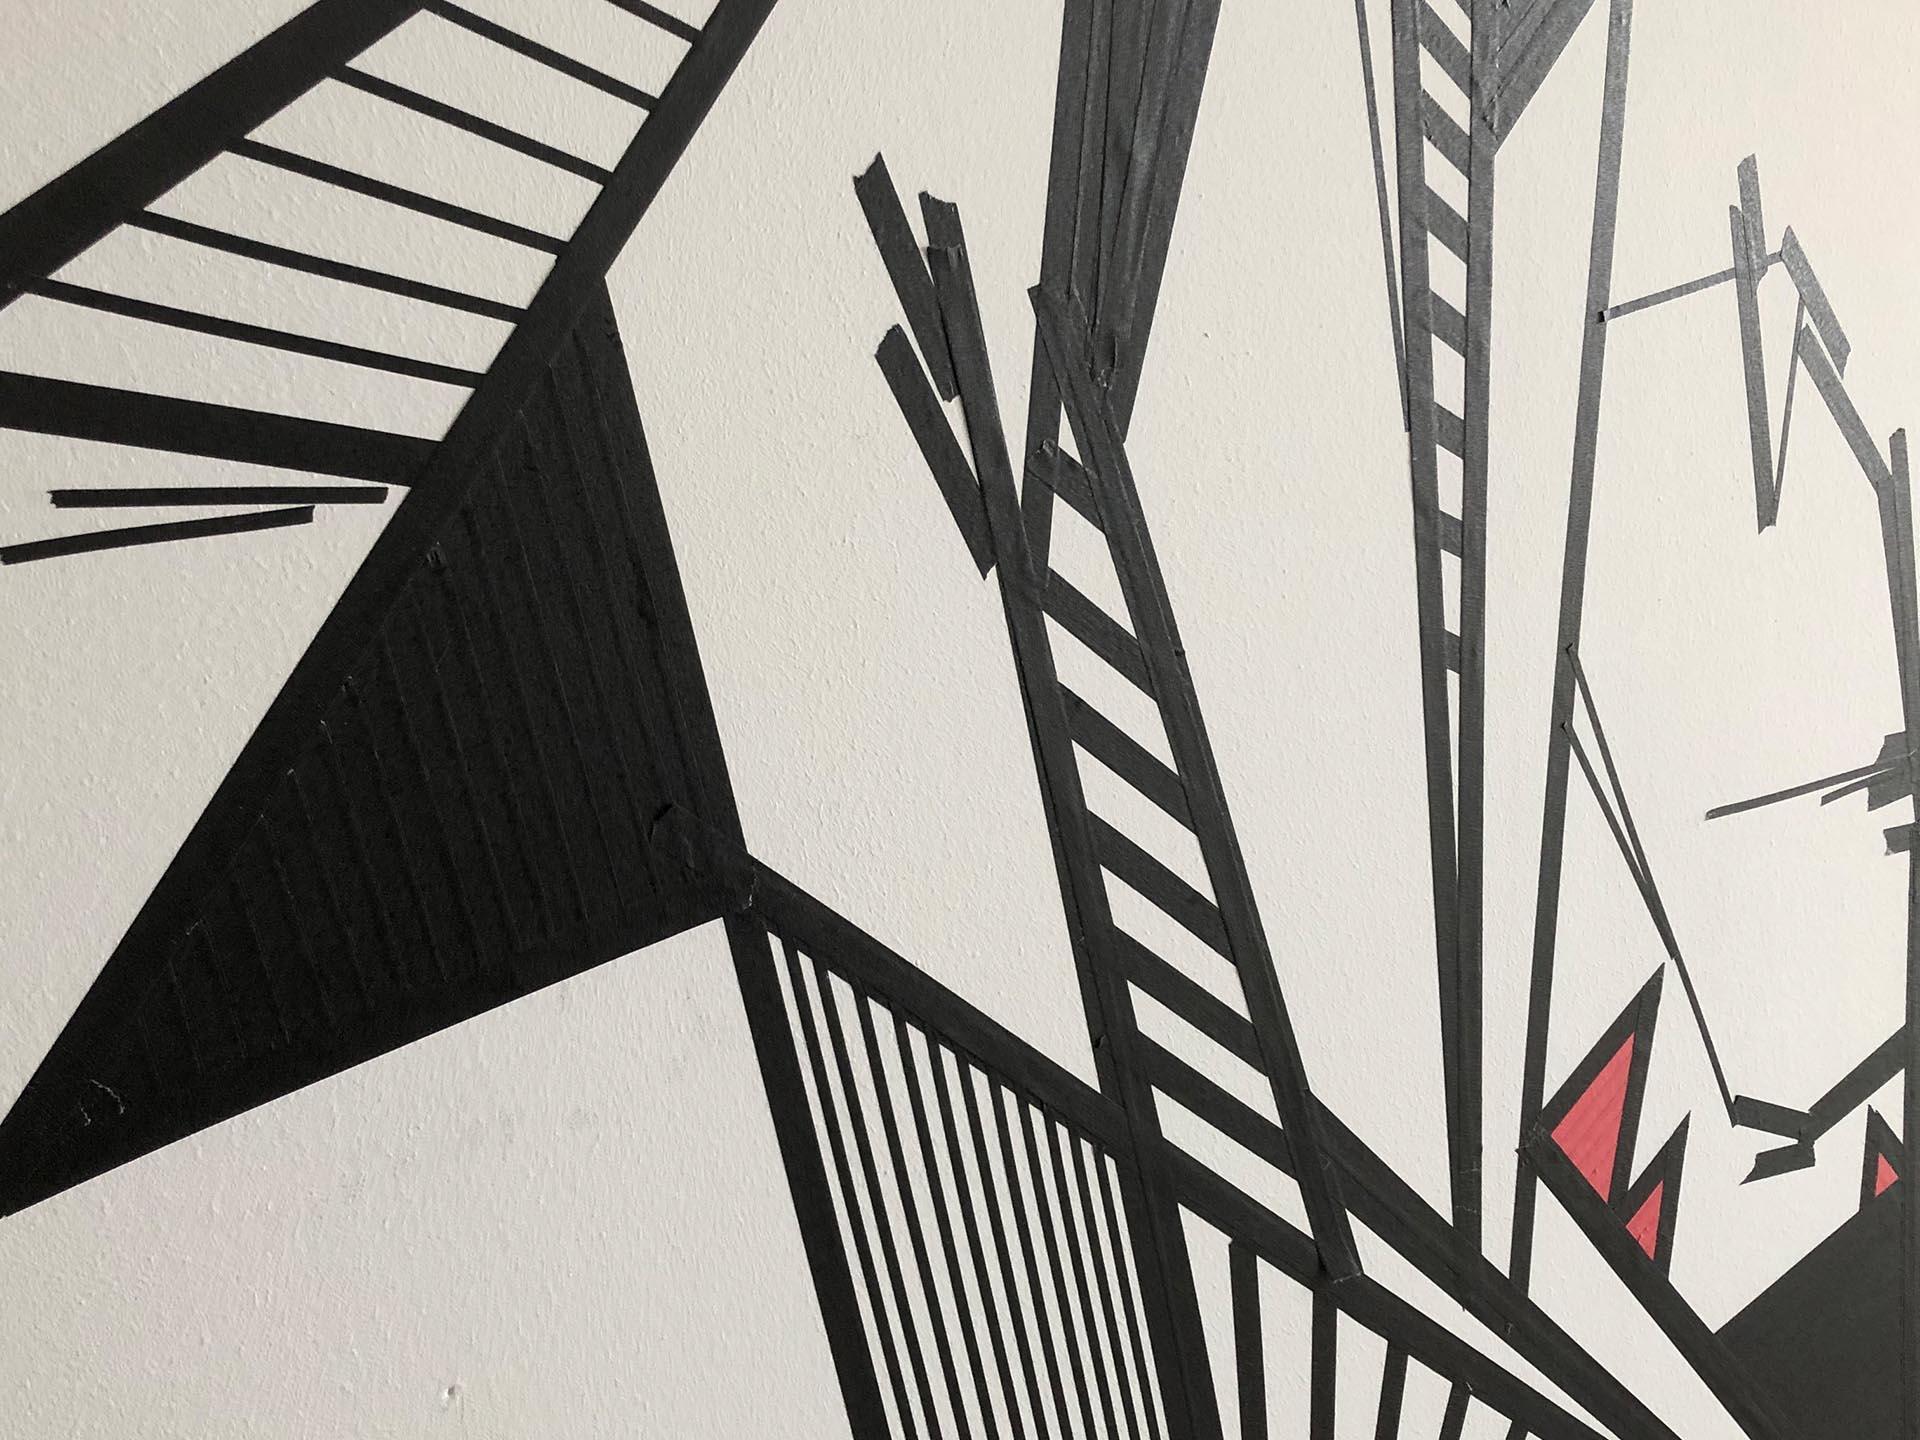 Tape-Art, Graffiti, Münster, Büro, Foyer, Design, Grafik, Piratelove, Auckz